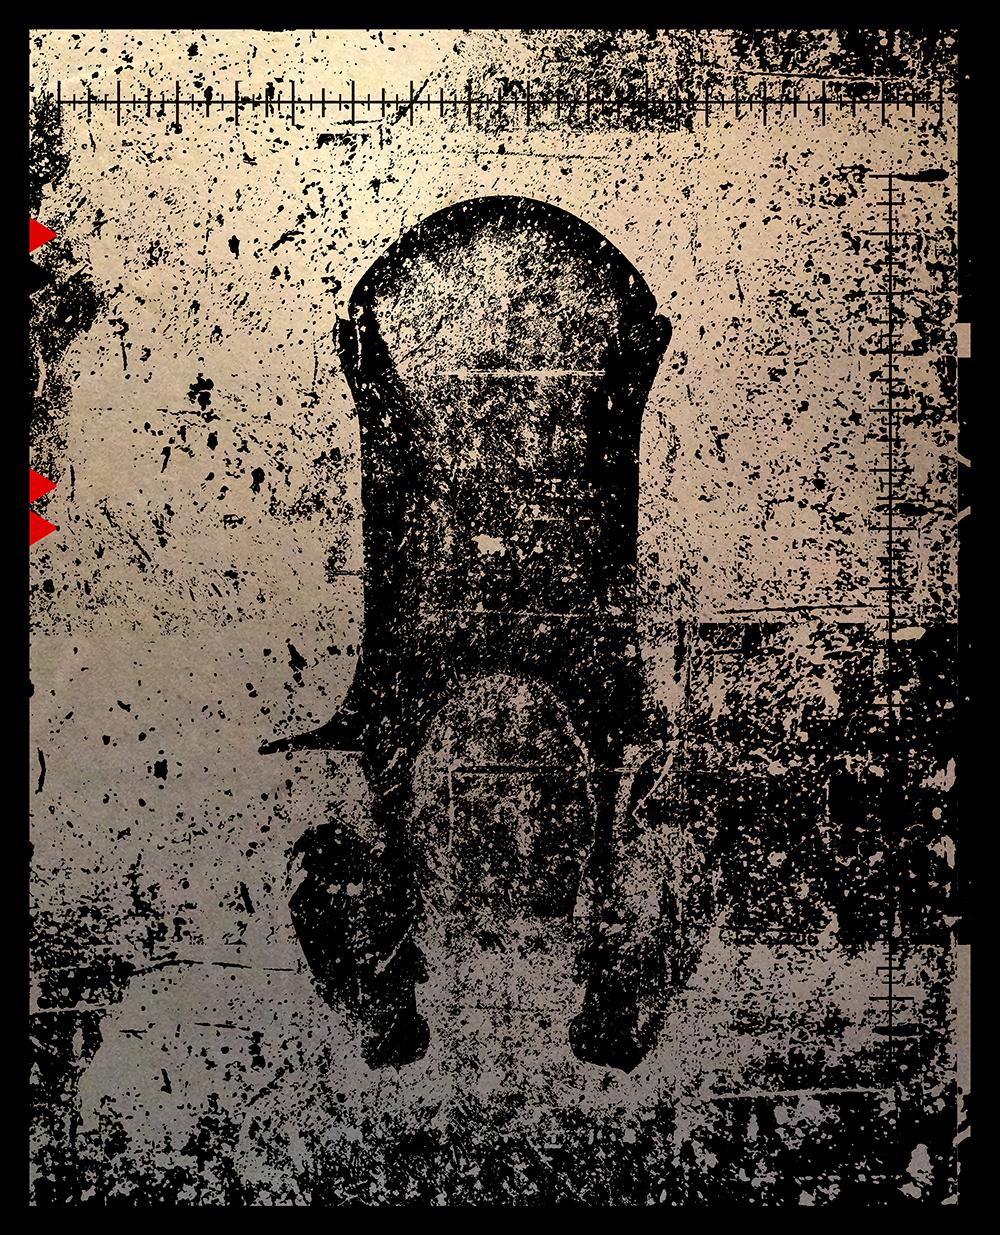 SALACIA-silhouette-1.png